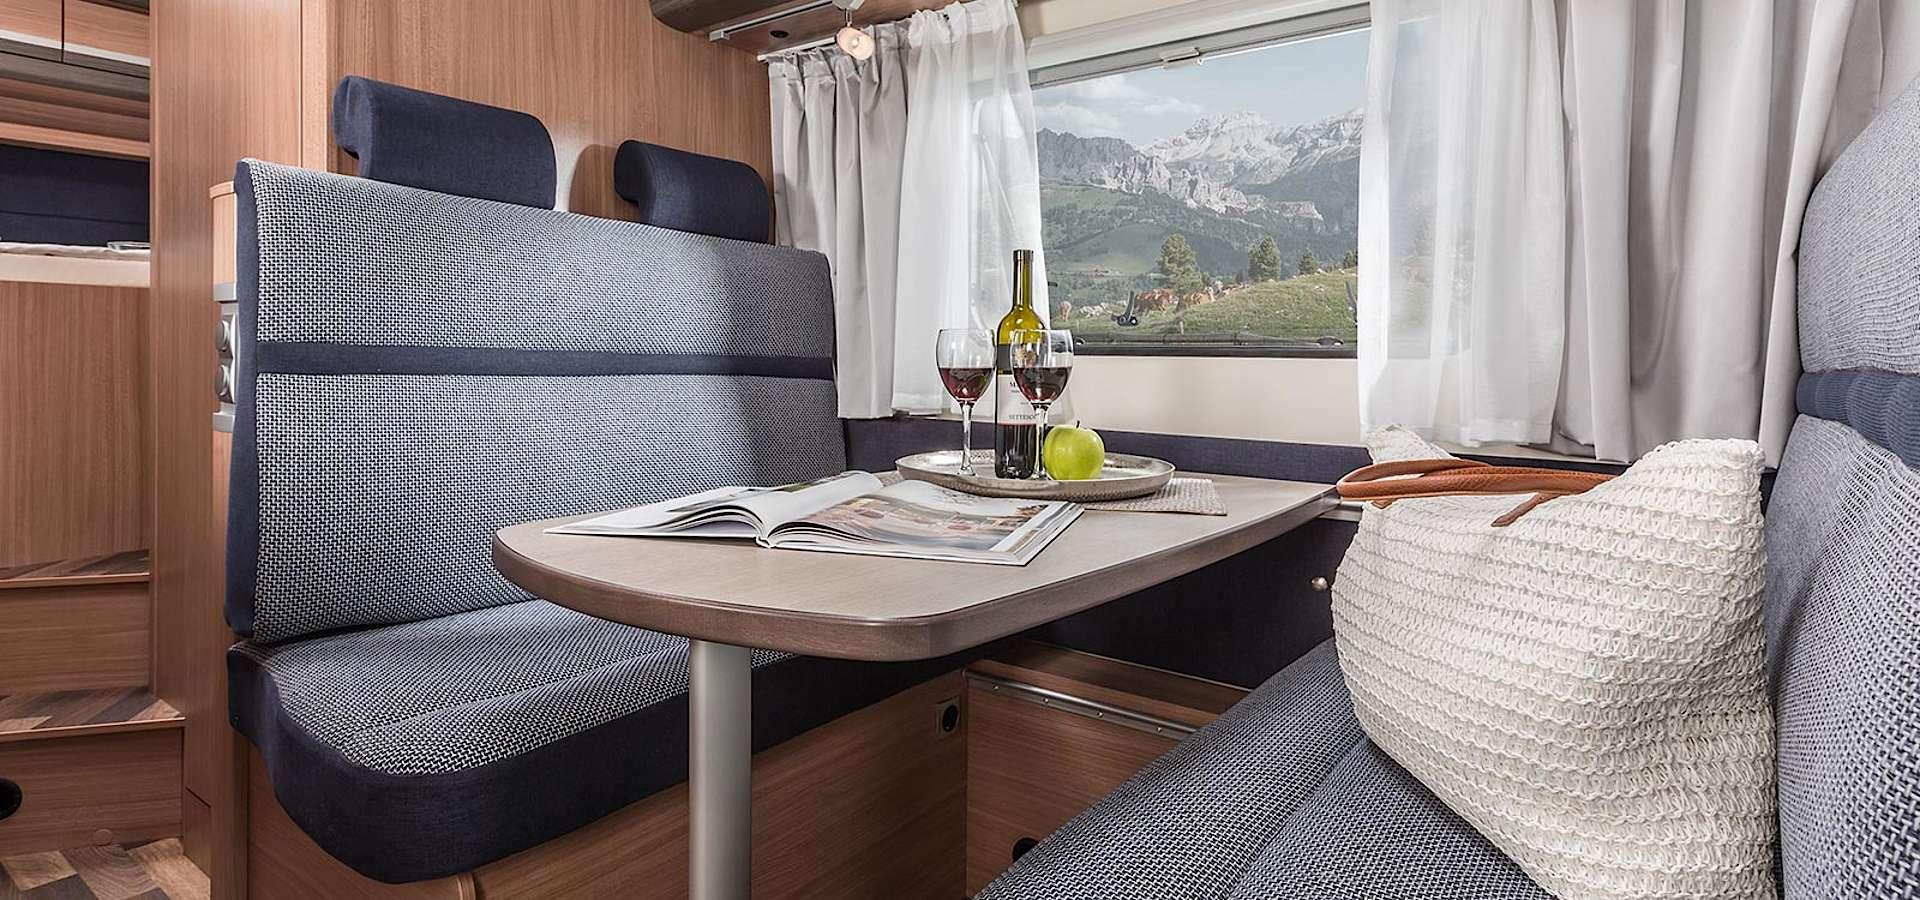 reisemobile stolz siegen wohnmobile nrw wohnmobil stolz. Black Bedroom Furniture Sets. Home Design Ideas